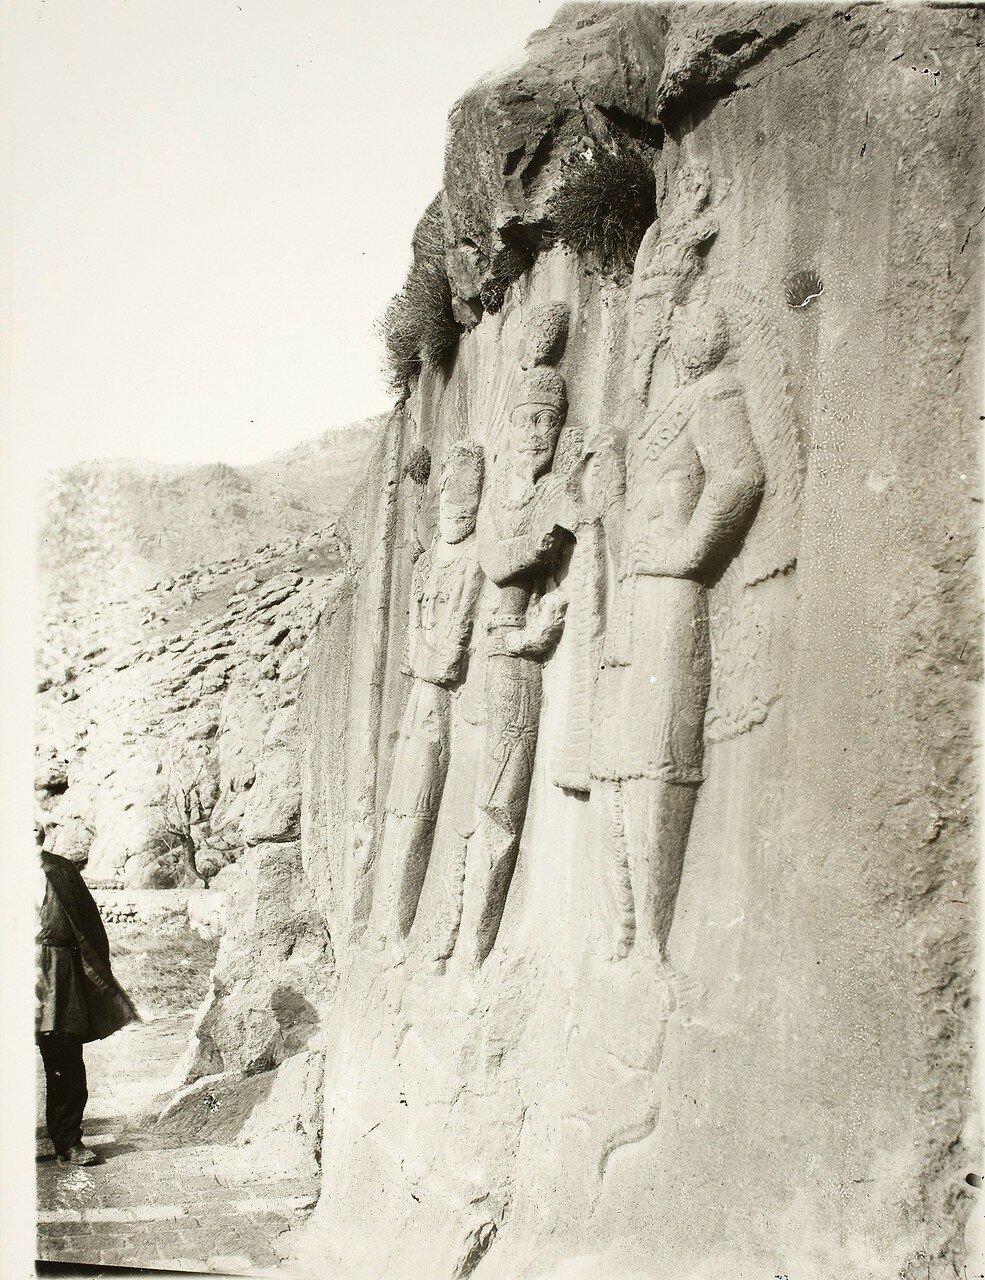 Таге-Бостан. Сасанидские рельефы. Вид сбоку на инвеституру Ардашира II